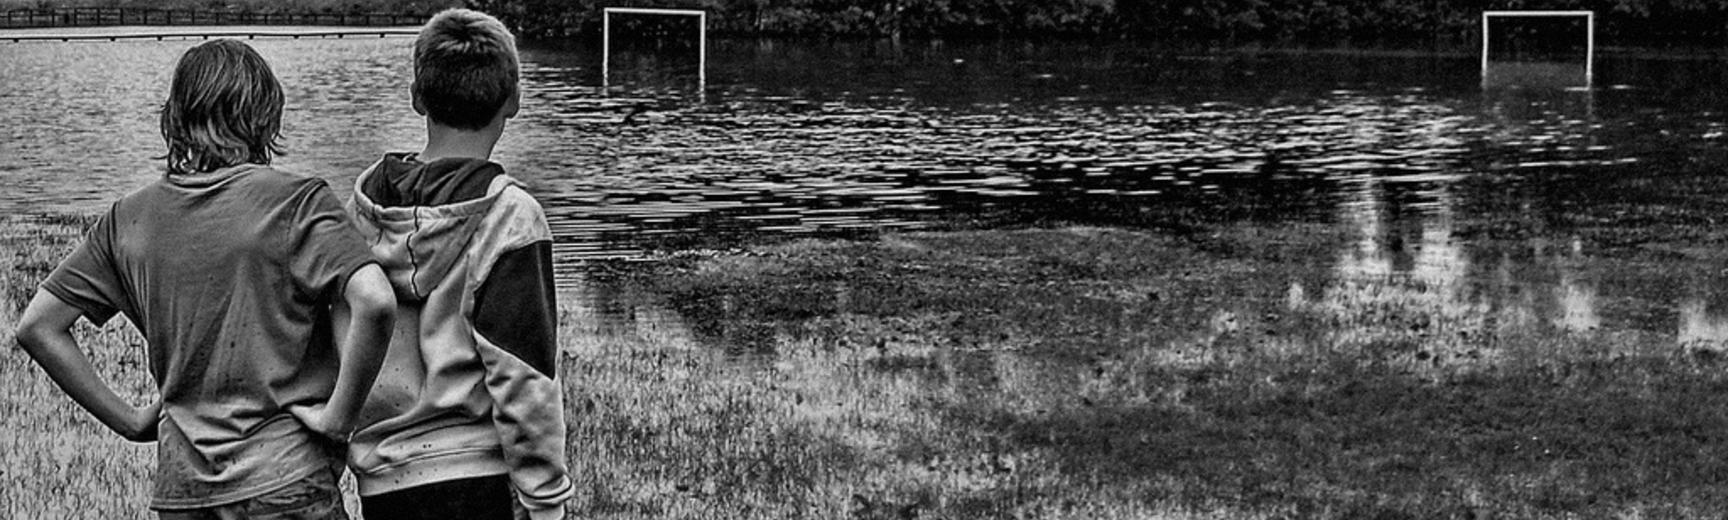 reduce flooding